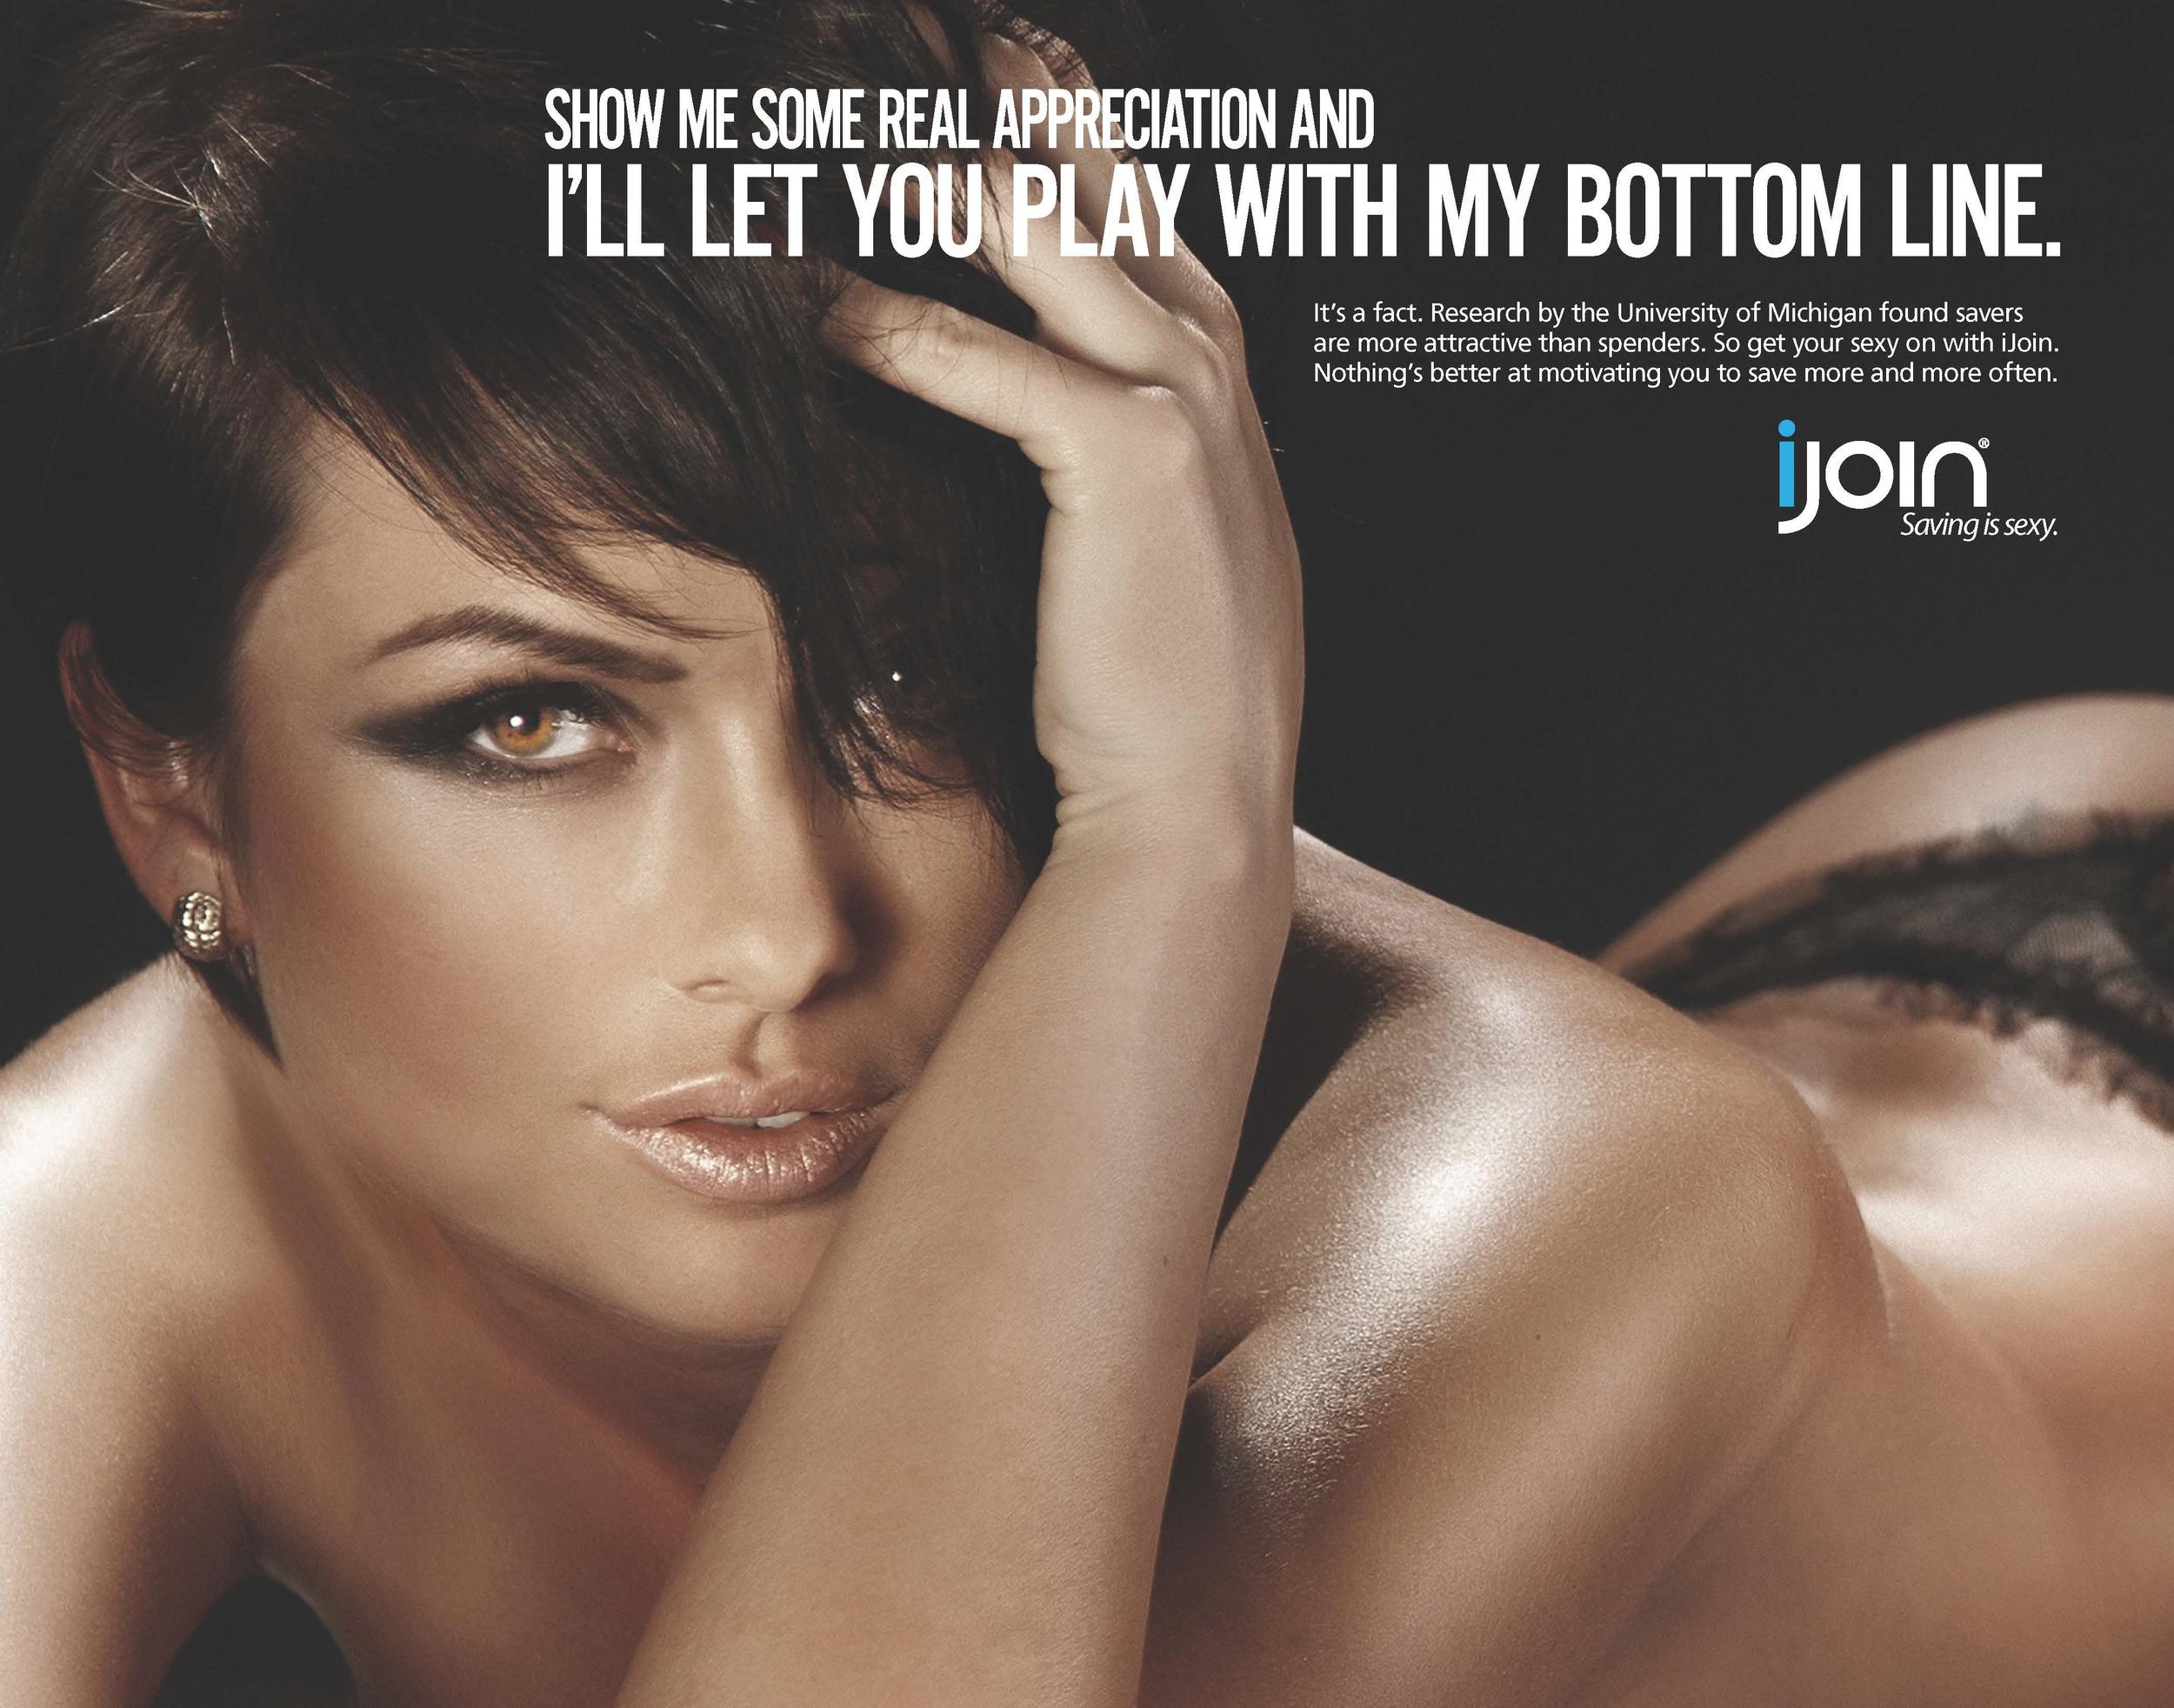 IJO.BottomLine.jpg